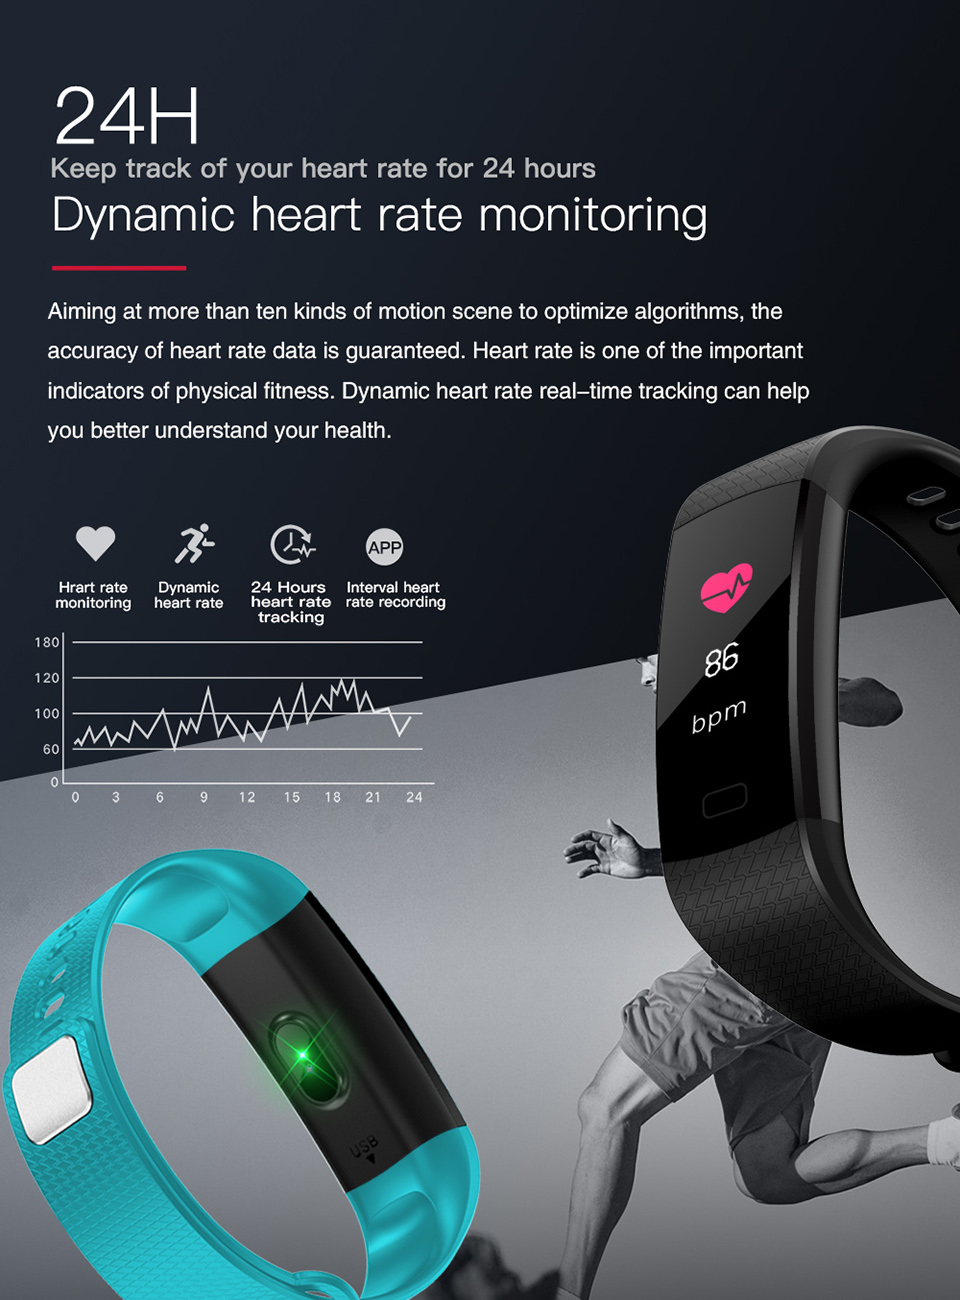 HTB1dt8 gKGSBuNjSspbq6AiipXaP TimeOwner Smart Band Heart Rate Blood Pressure Monitor High Brightness Colorful Screen Smart Bracelet Wristband Notification